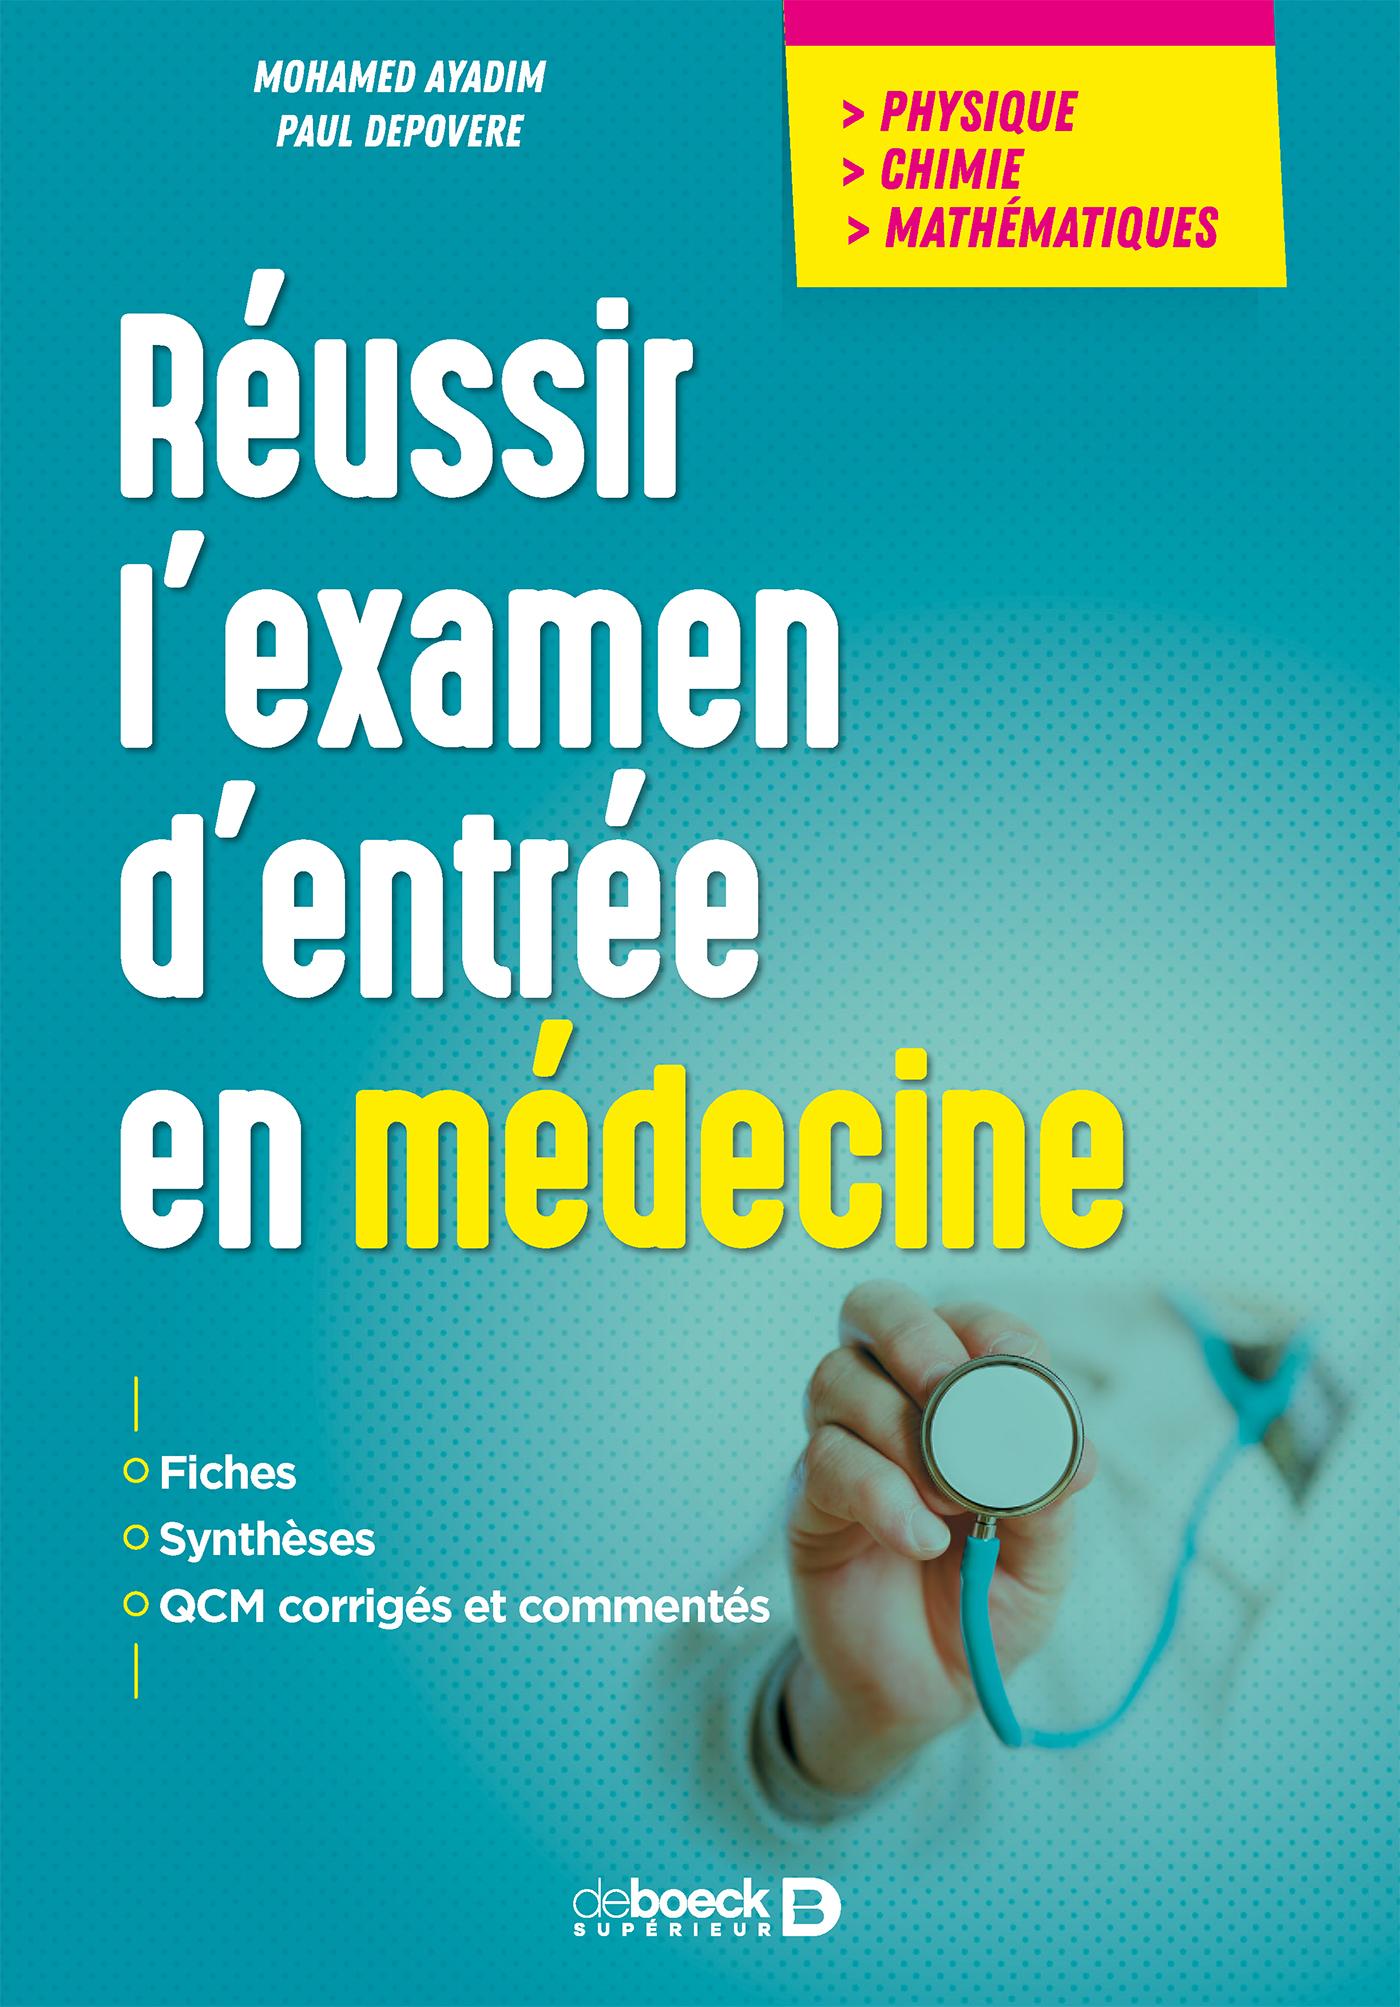 REUSSIR L'EXAMEN D'ENTREE EN MEDECINE